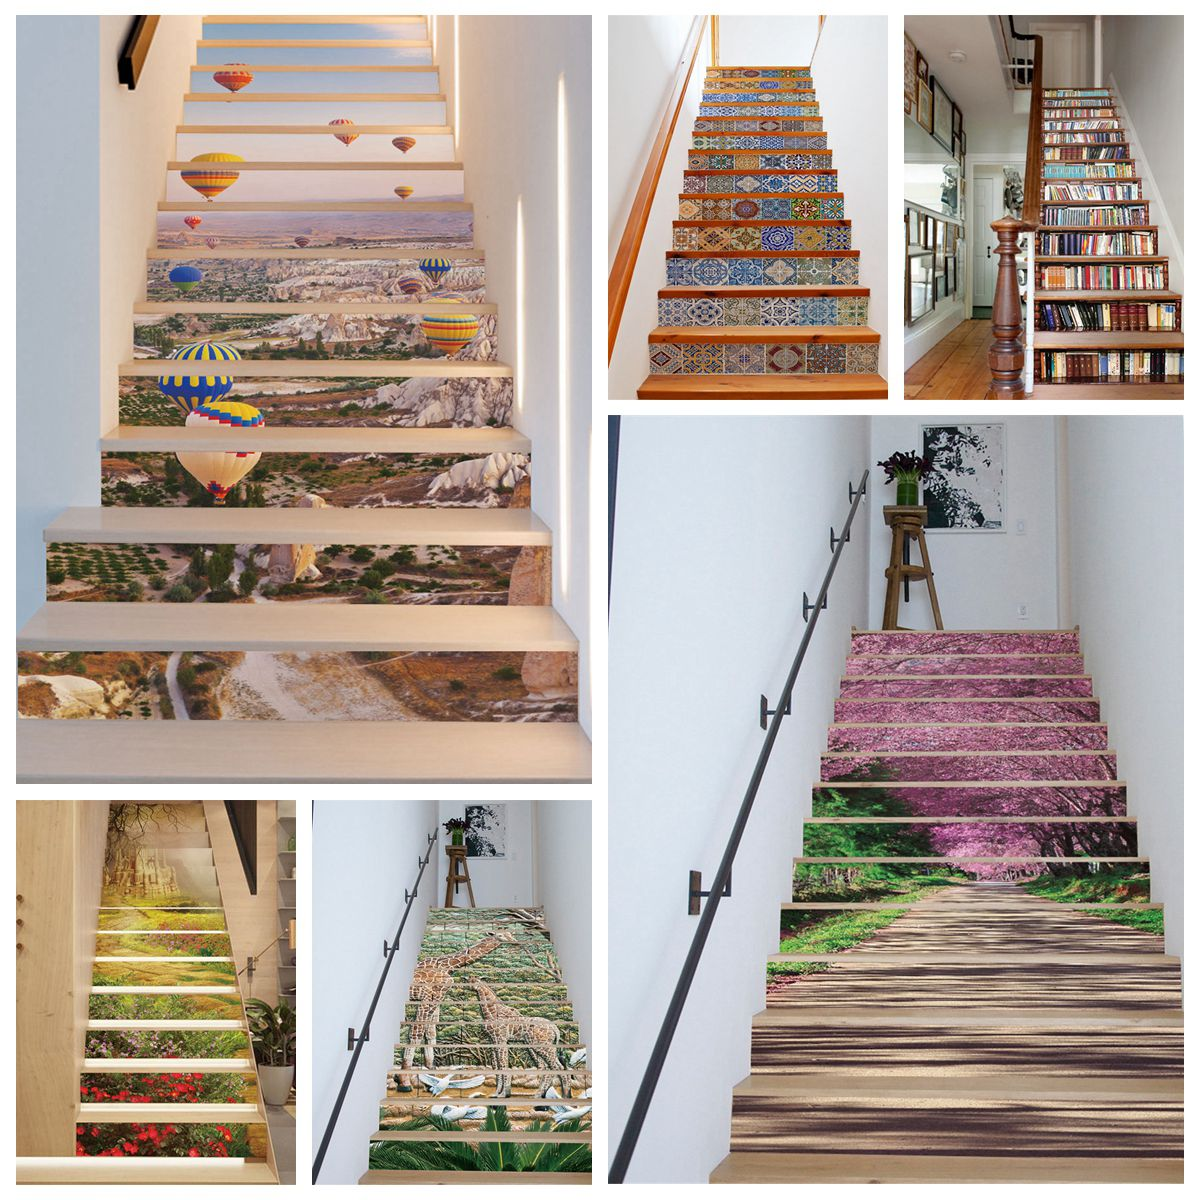 13stk 3d treppen treppenhaus tapete aufkleber sticker t r dekoration 18x100cm ebay. Black Bedroom Furniture Sets. Home Design Ideas